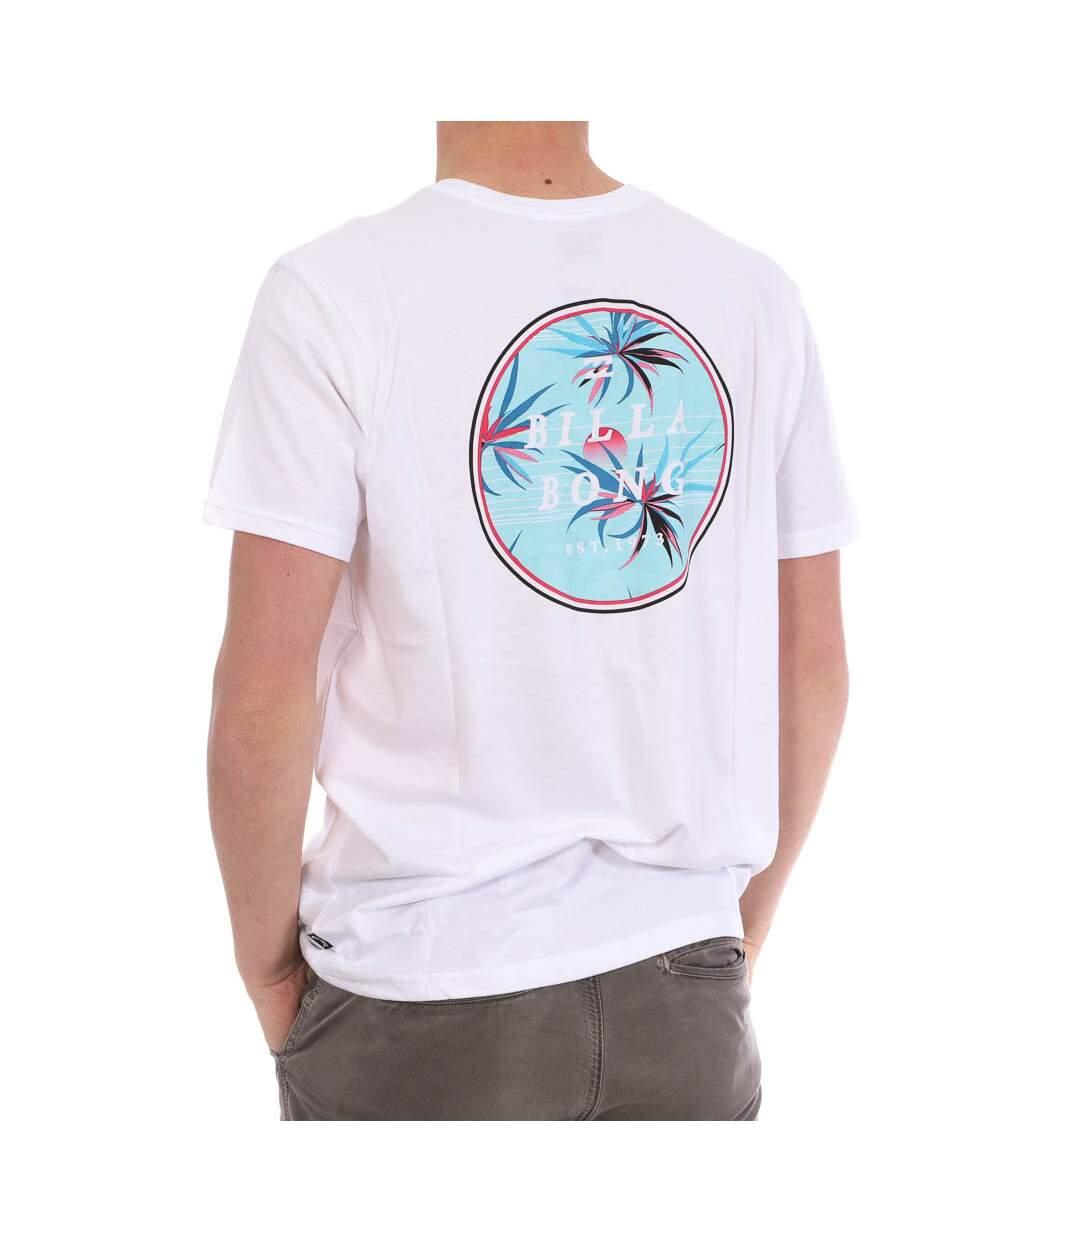 T-shirt Blanc Homme Billabong Rotor